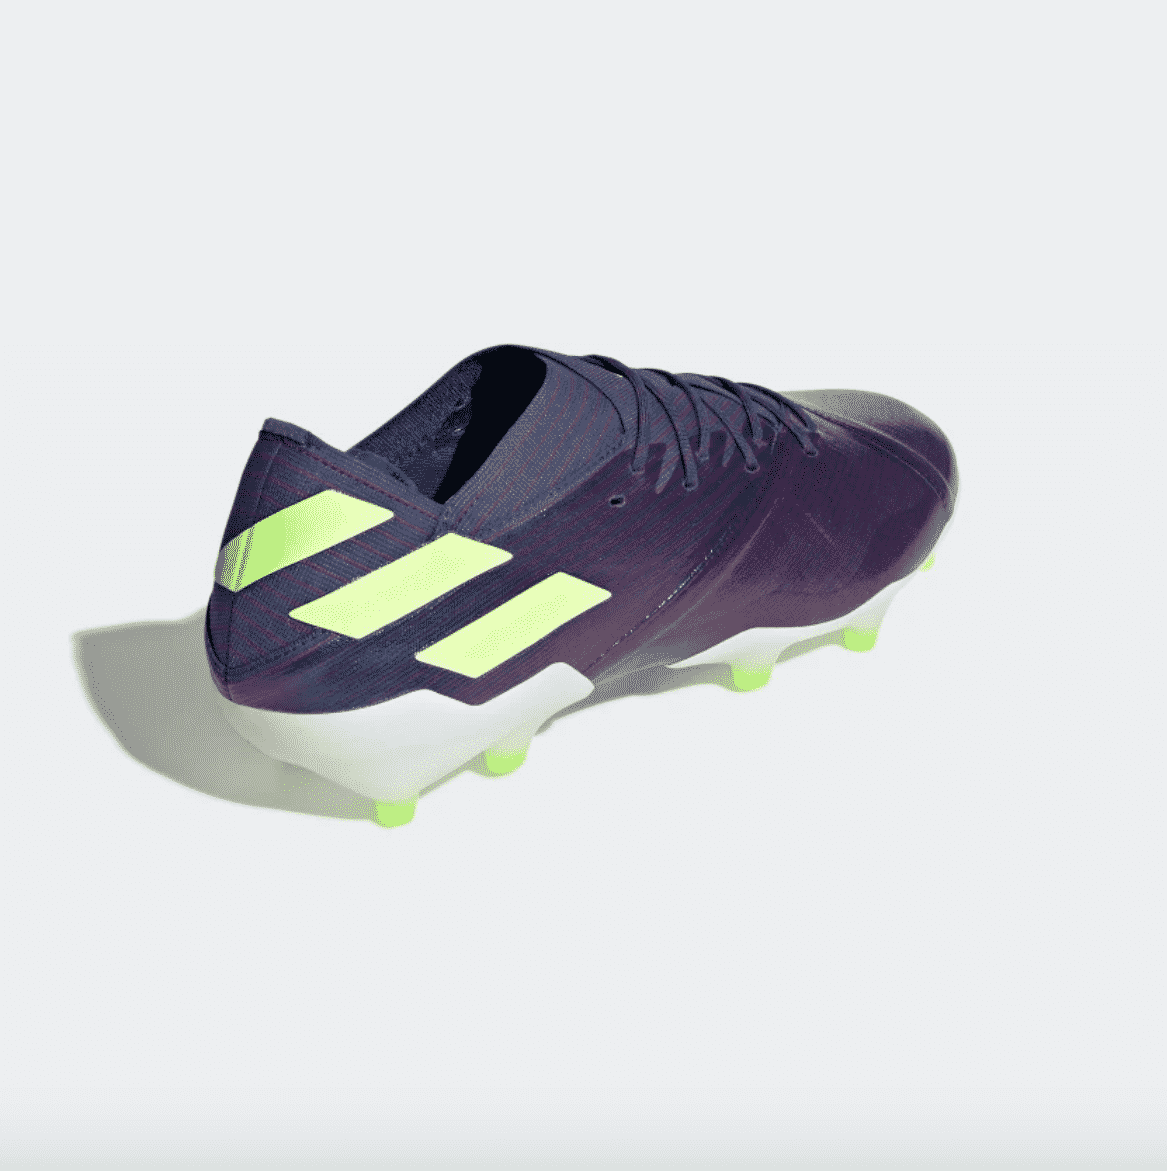 chaussures-adidas-nemeziz-19.1-lionel-messi-ballon-or-2019-6